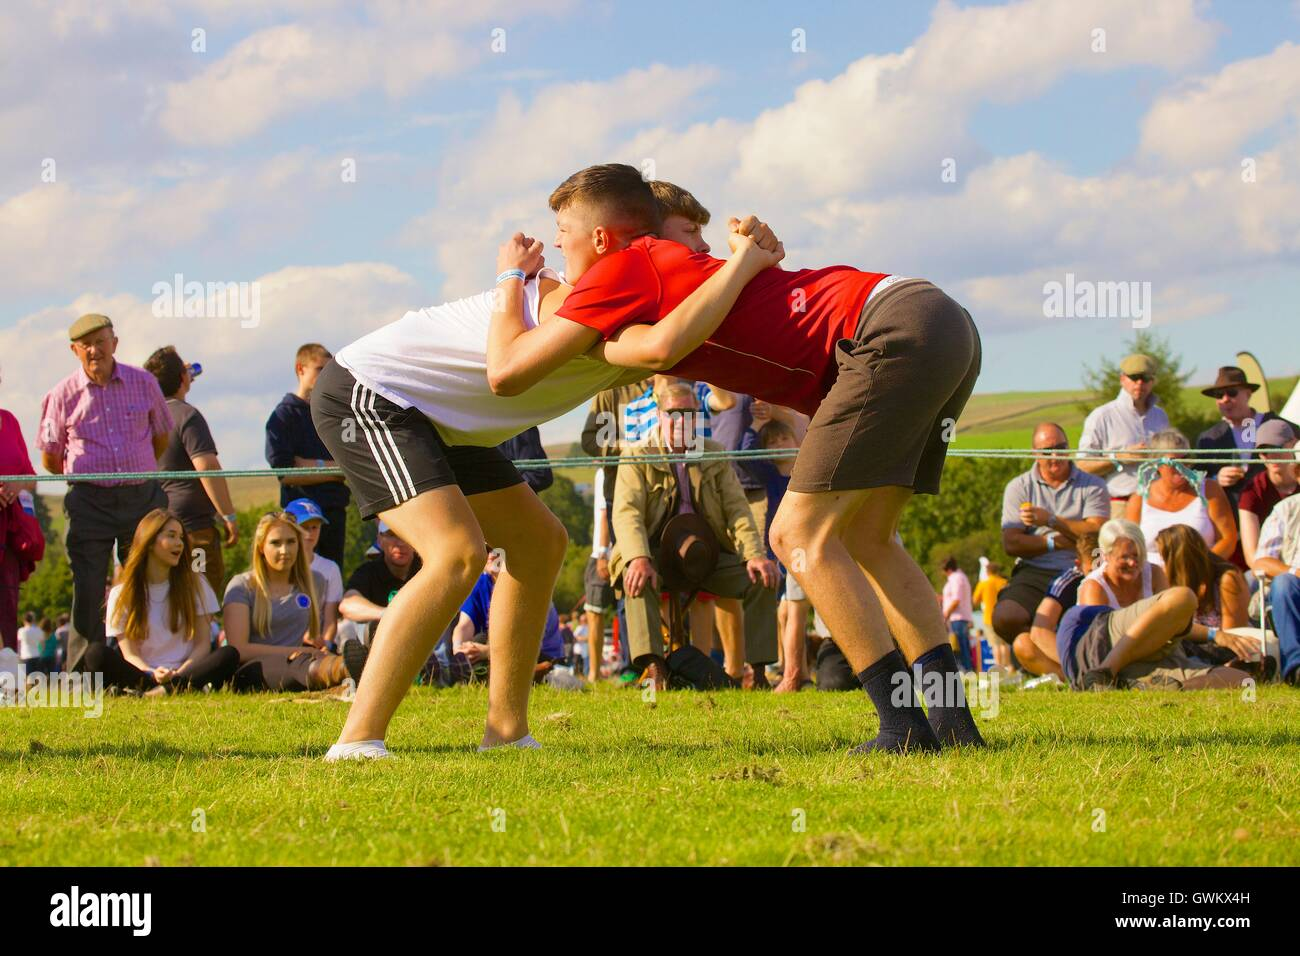 Los hombres jóvenes Cumberland Wrestling. Bellingham Show y el país Festival, Bellingham, Northumberland, Imagen De Stock